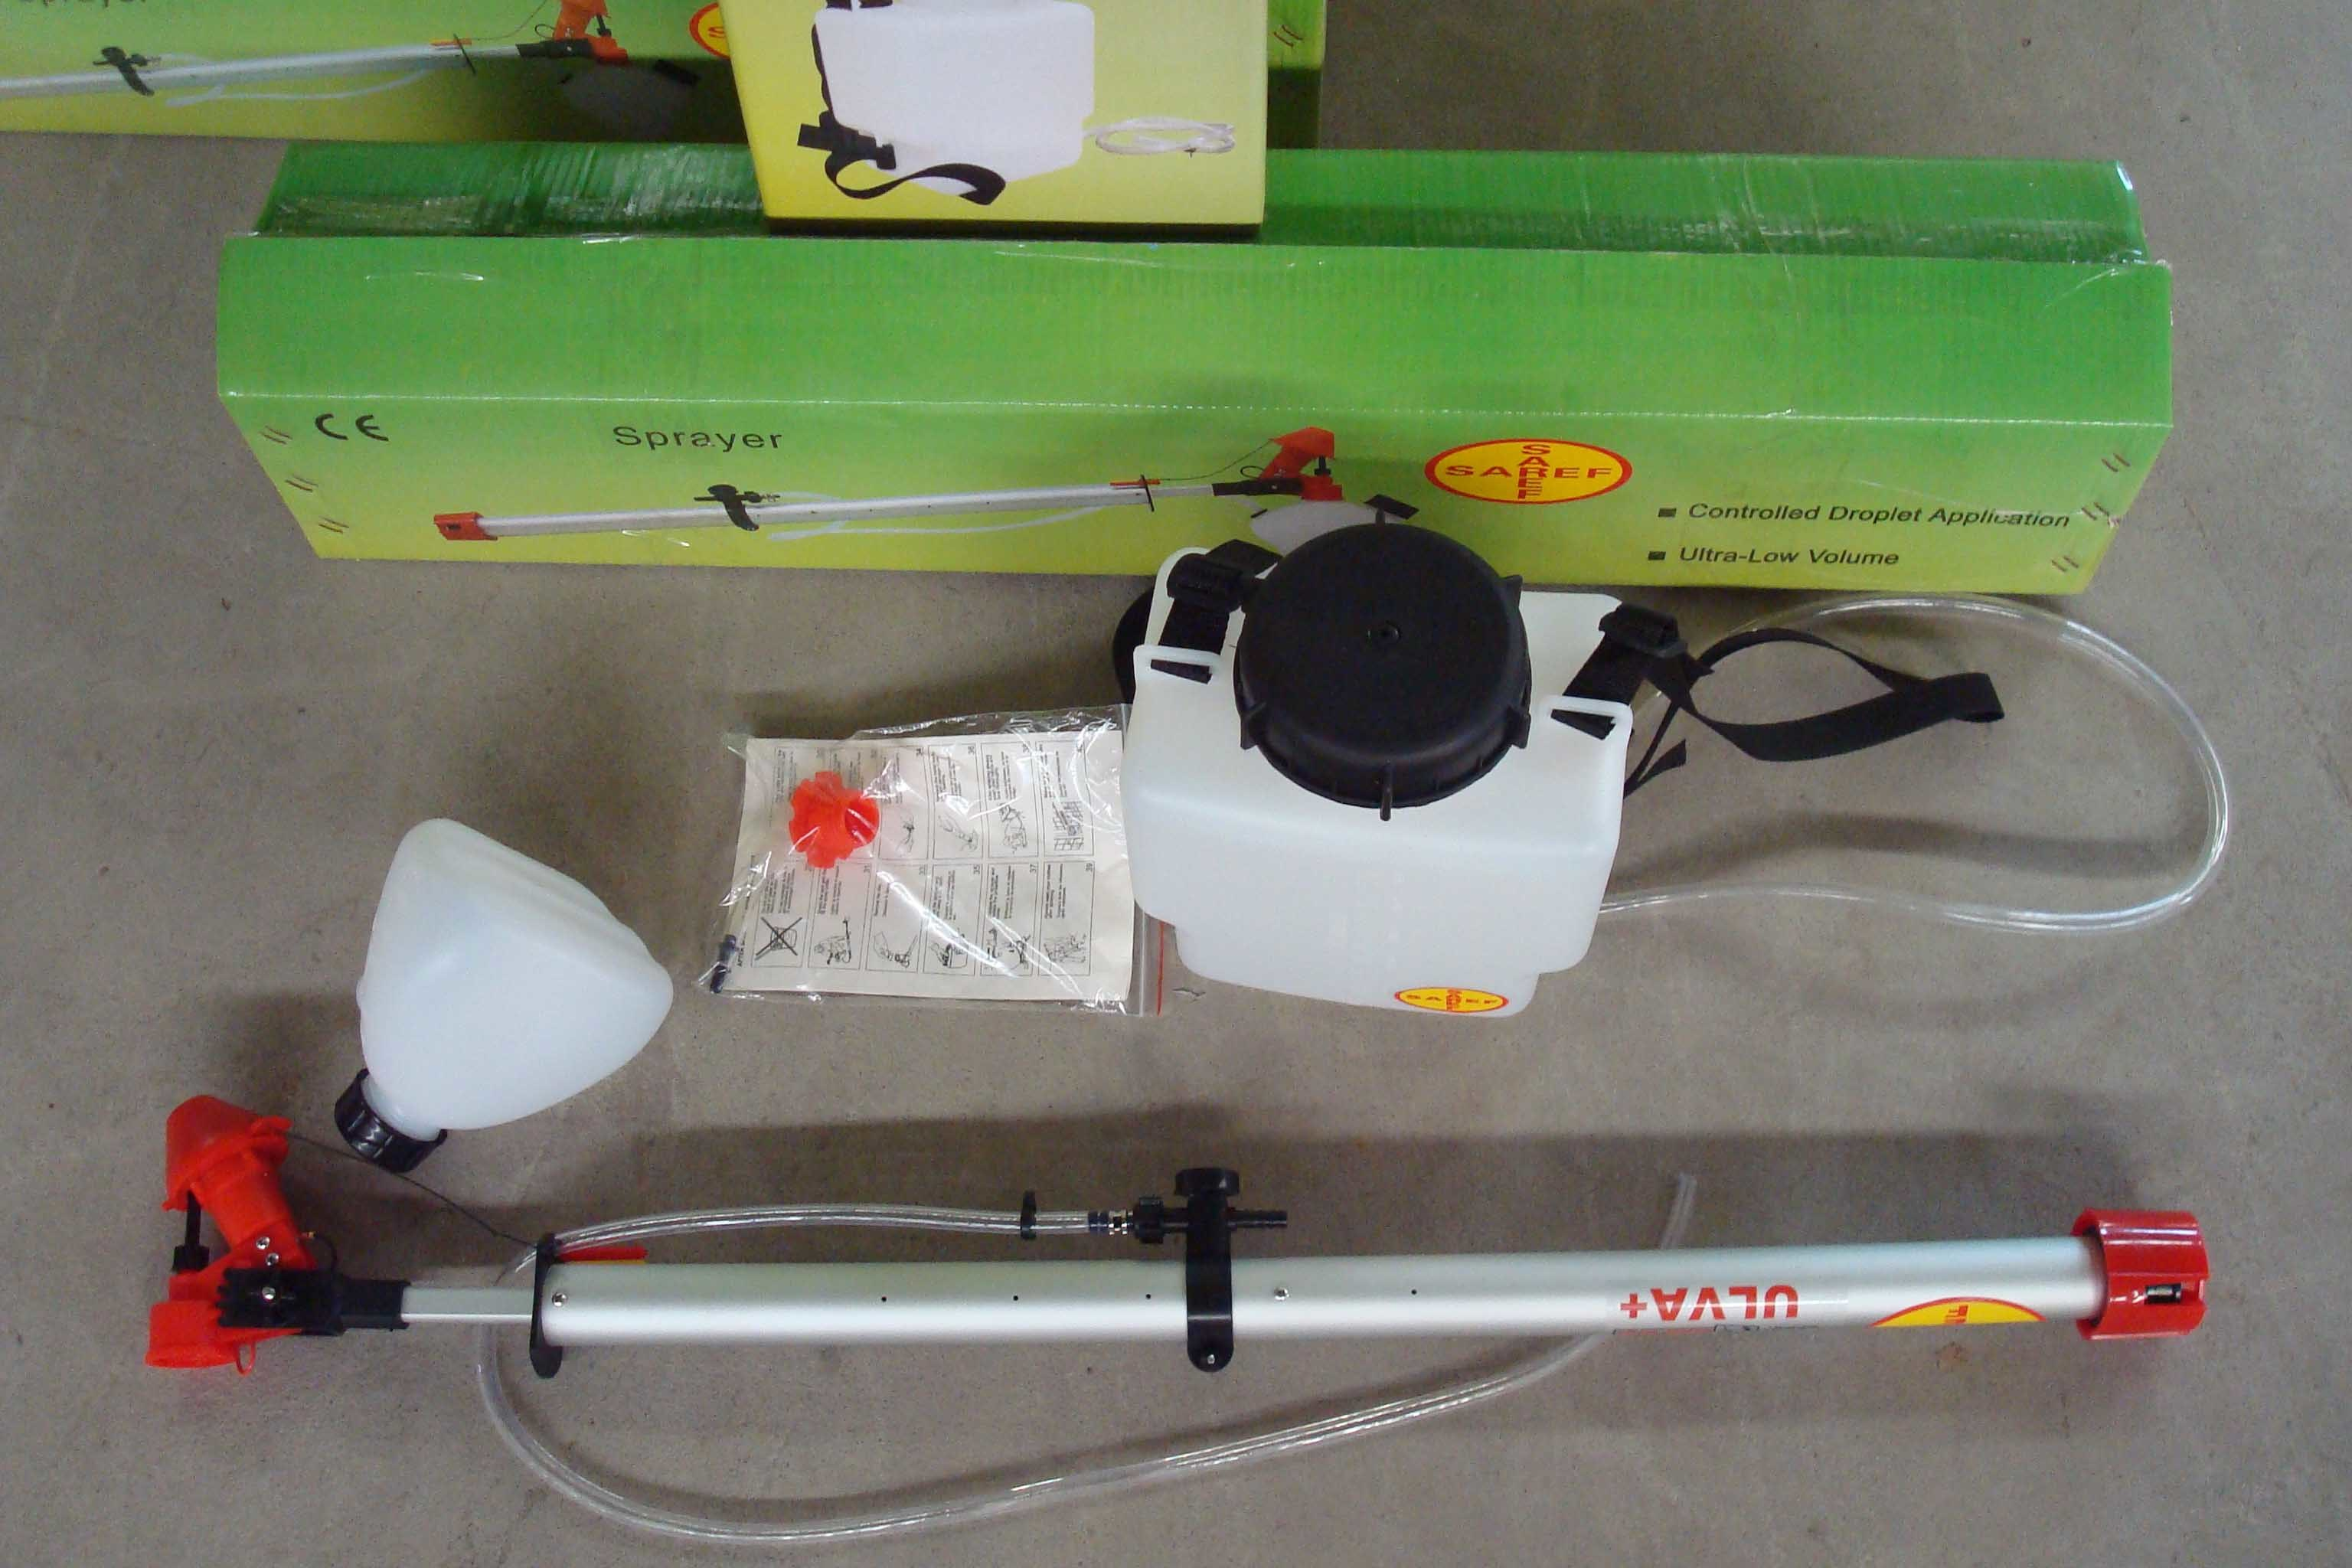 Ulva+ Spinning Disc Sprayer, Ulv Droplet Application Chemical Save Less Use Sprayer